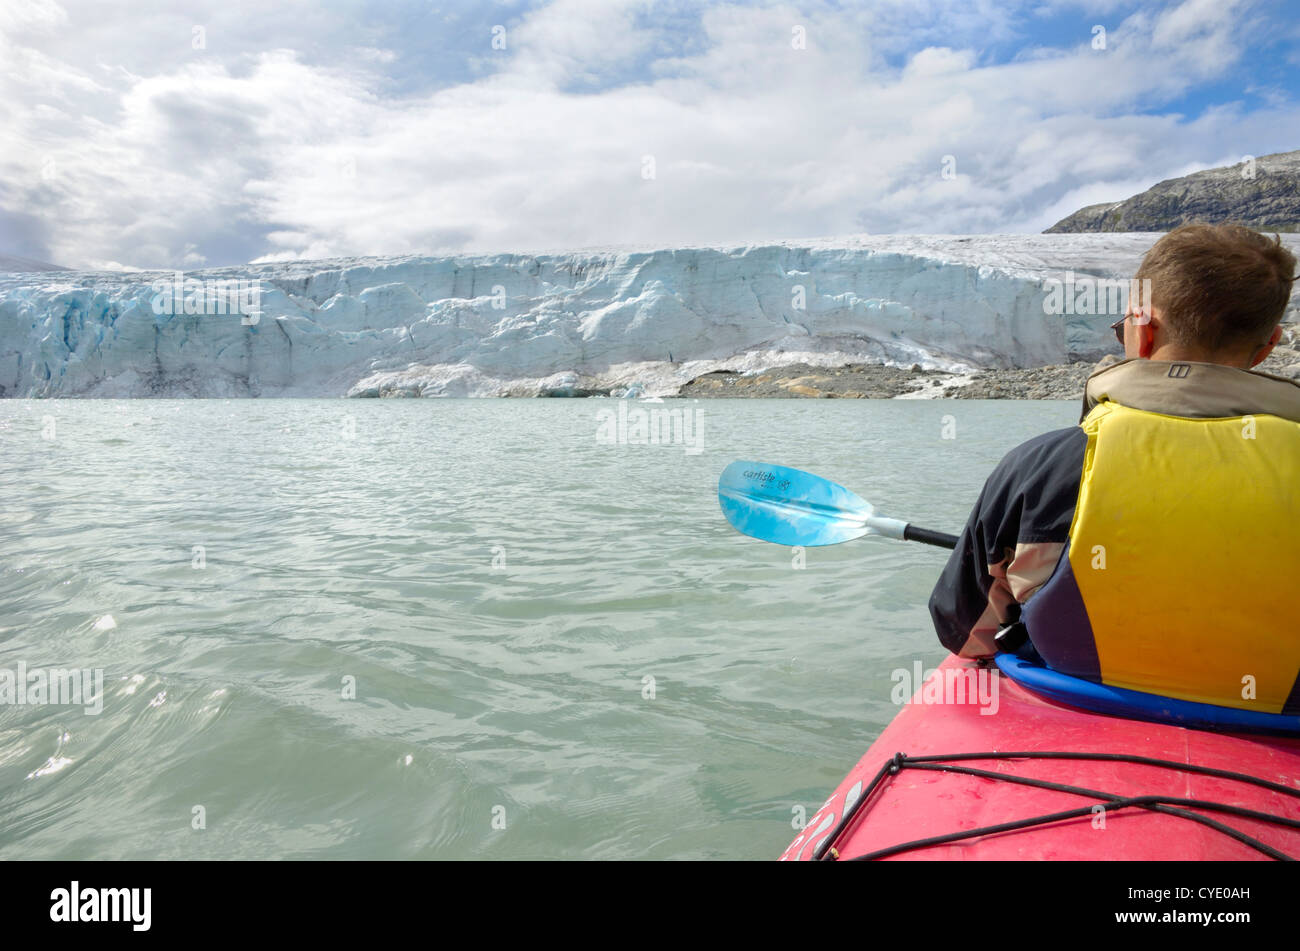 Kayaking to Austdalsbreen glacier, Styggevatnet lake, Jostedalsbreen icecap, Sogn og Fjordane, Norway - Stock Image